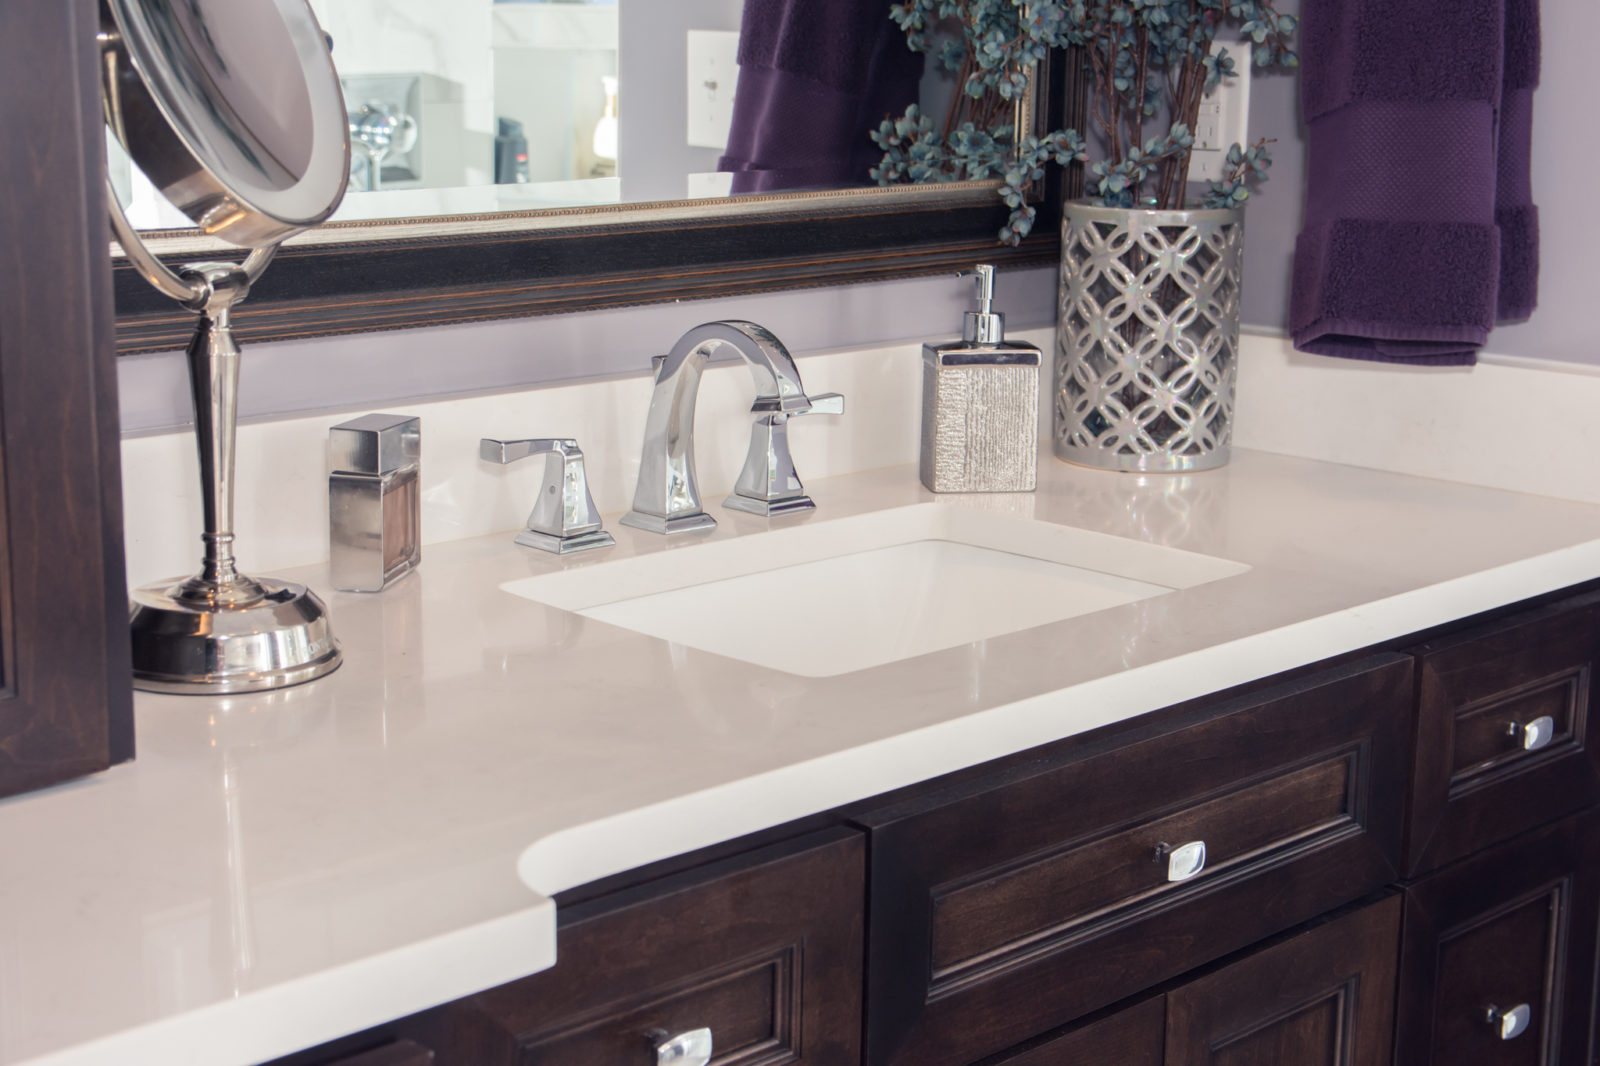 Waxhaw, NC home, bathroom with sink